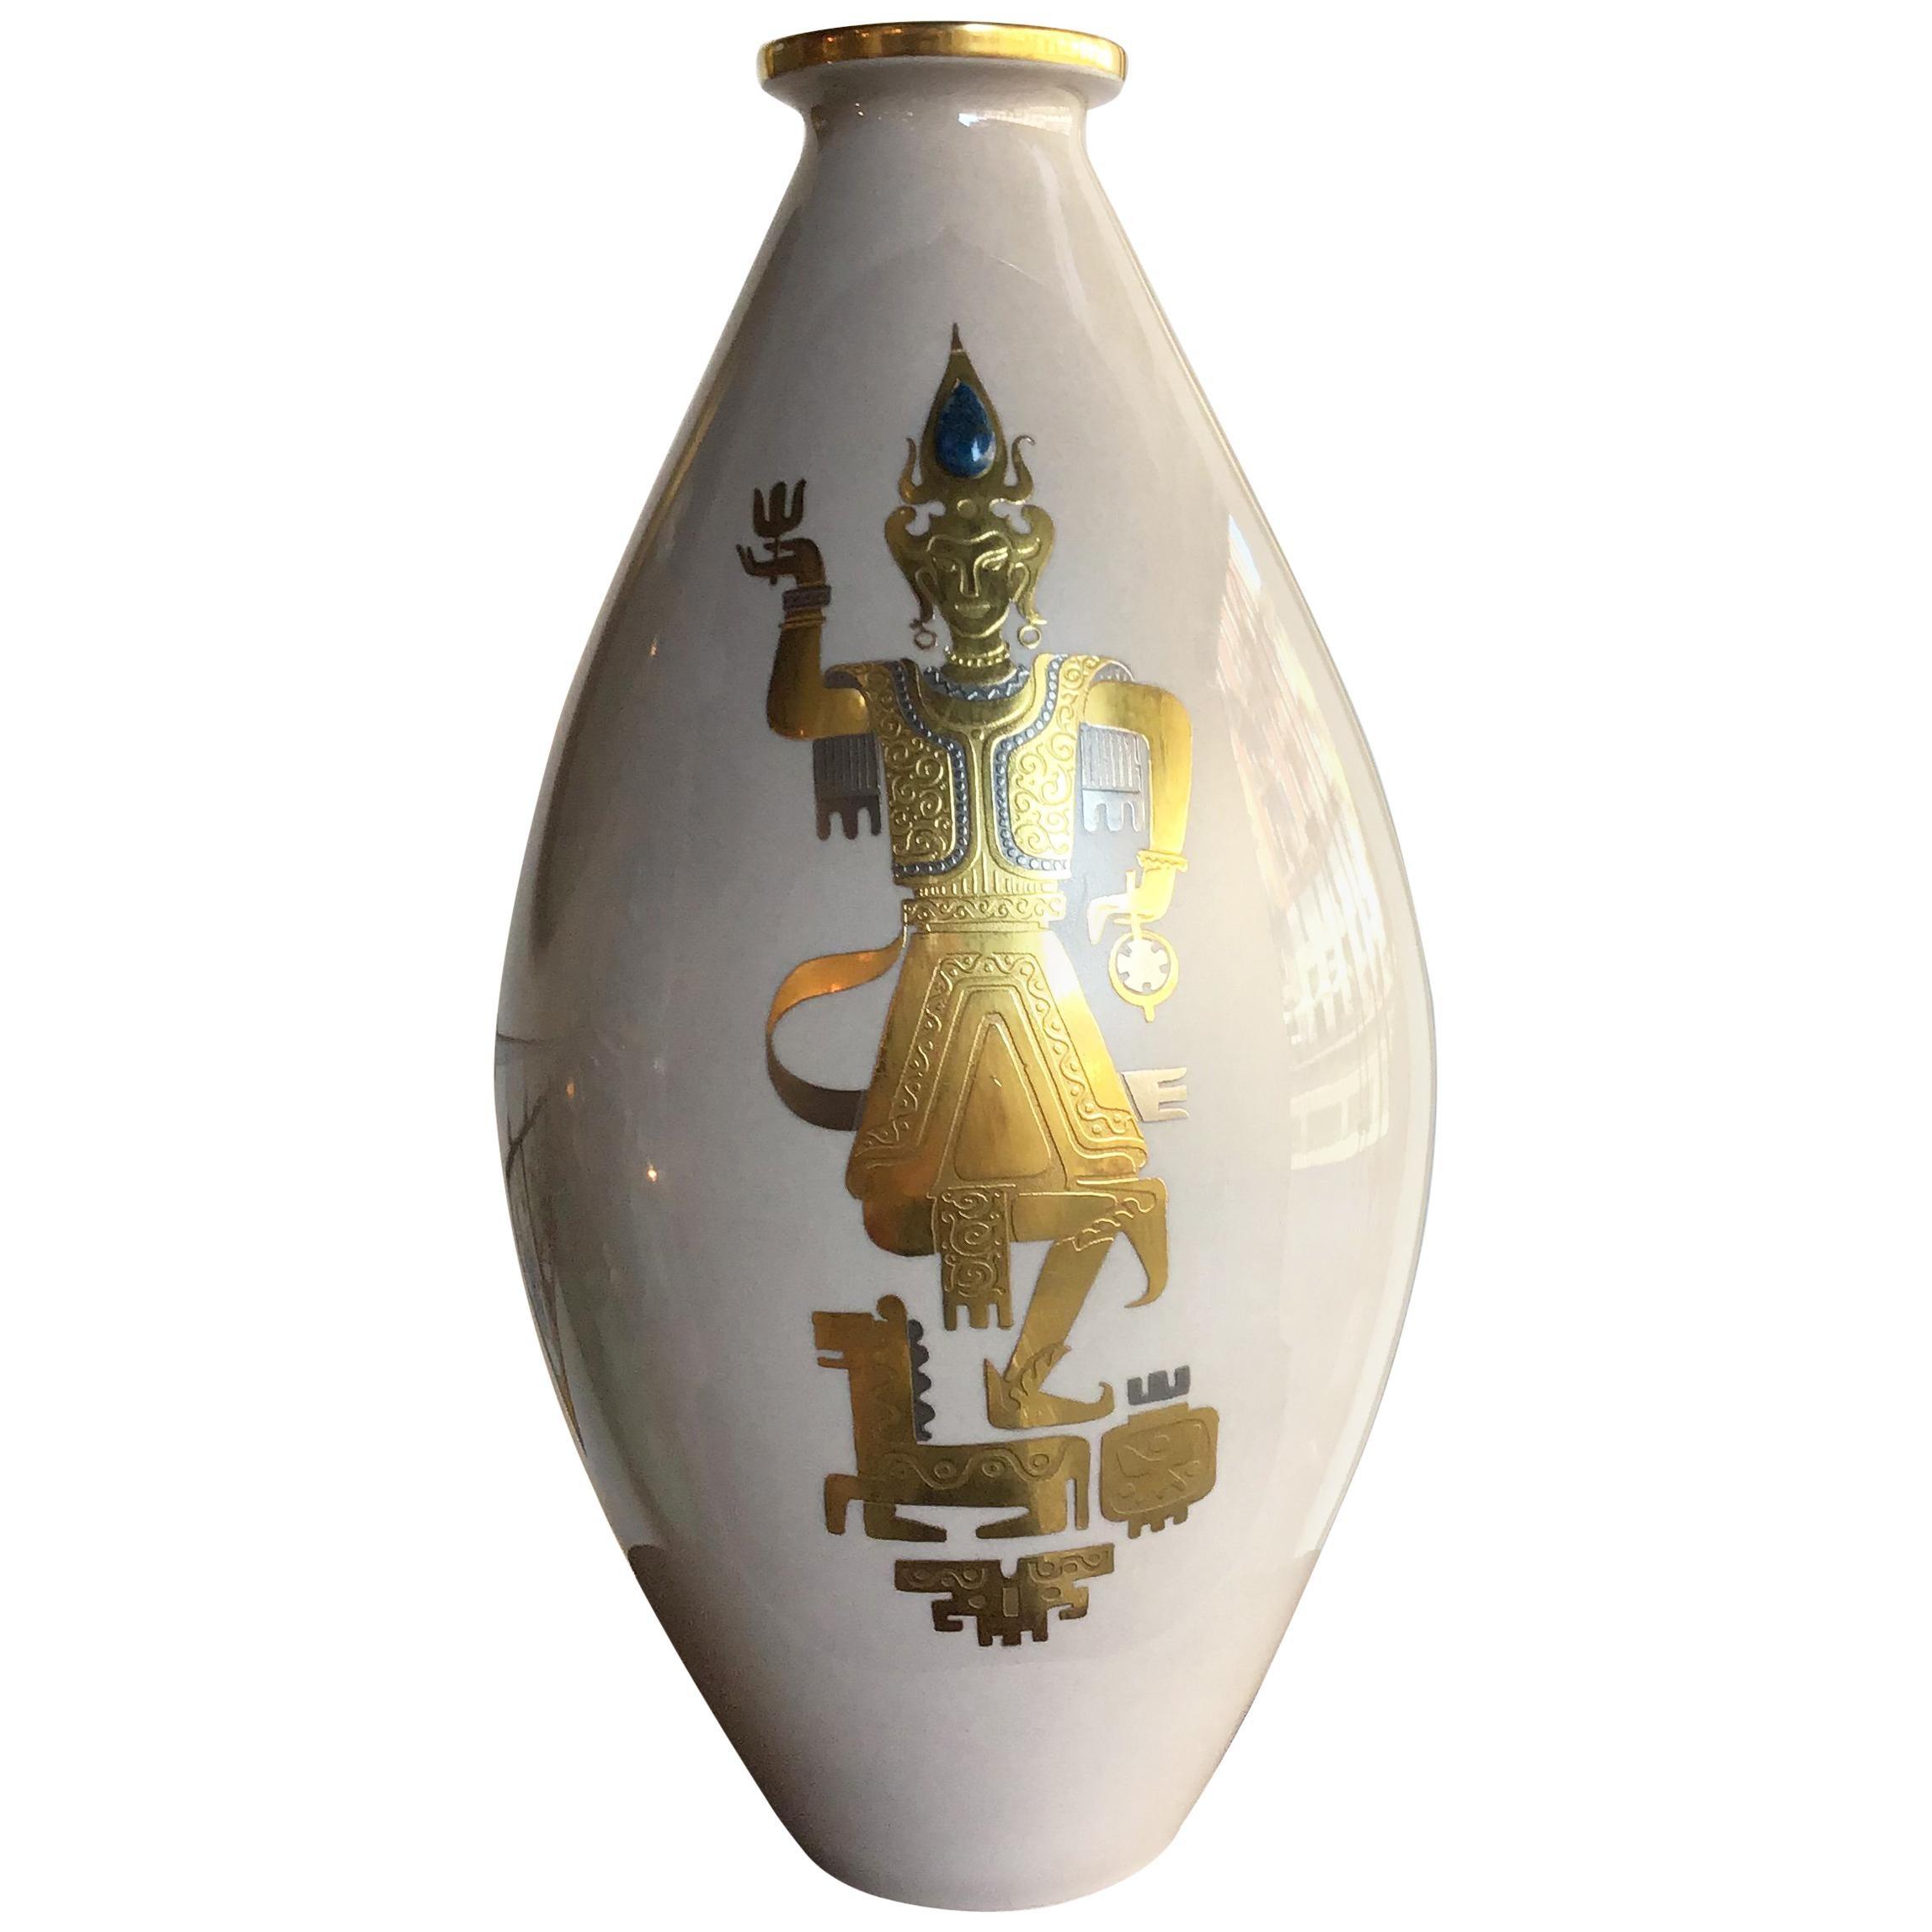 Finzi Vase 1950 Porcelain Gold, Italy